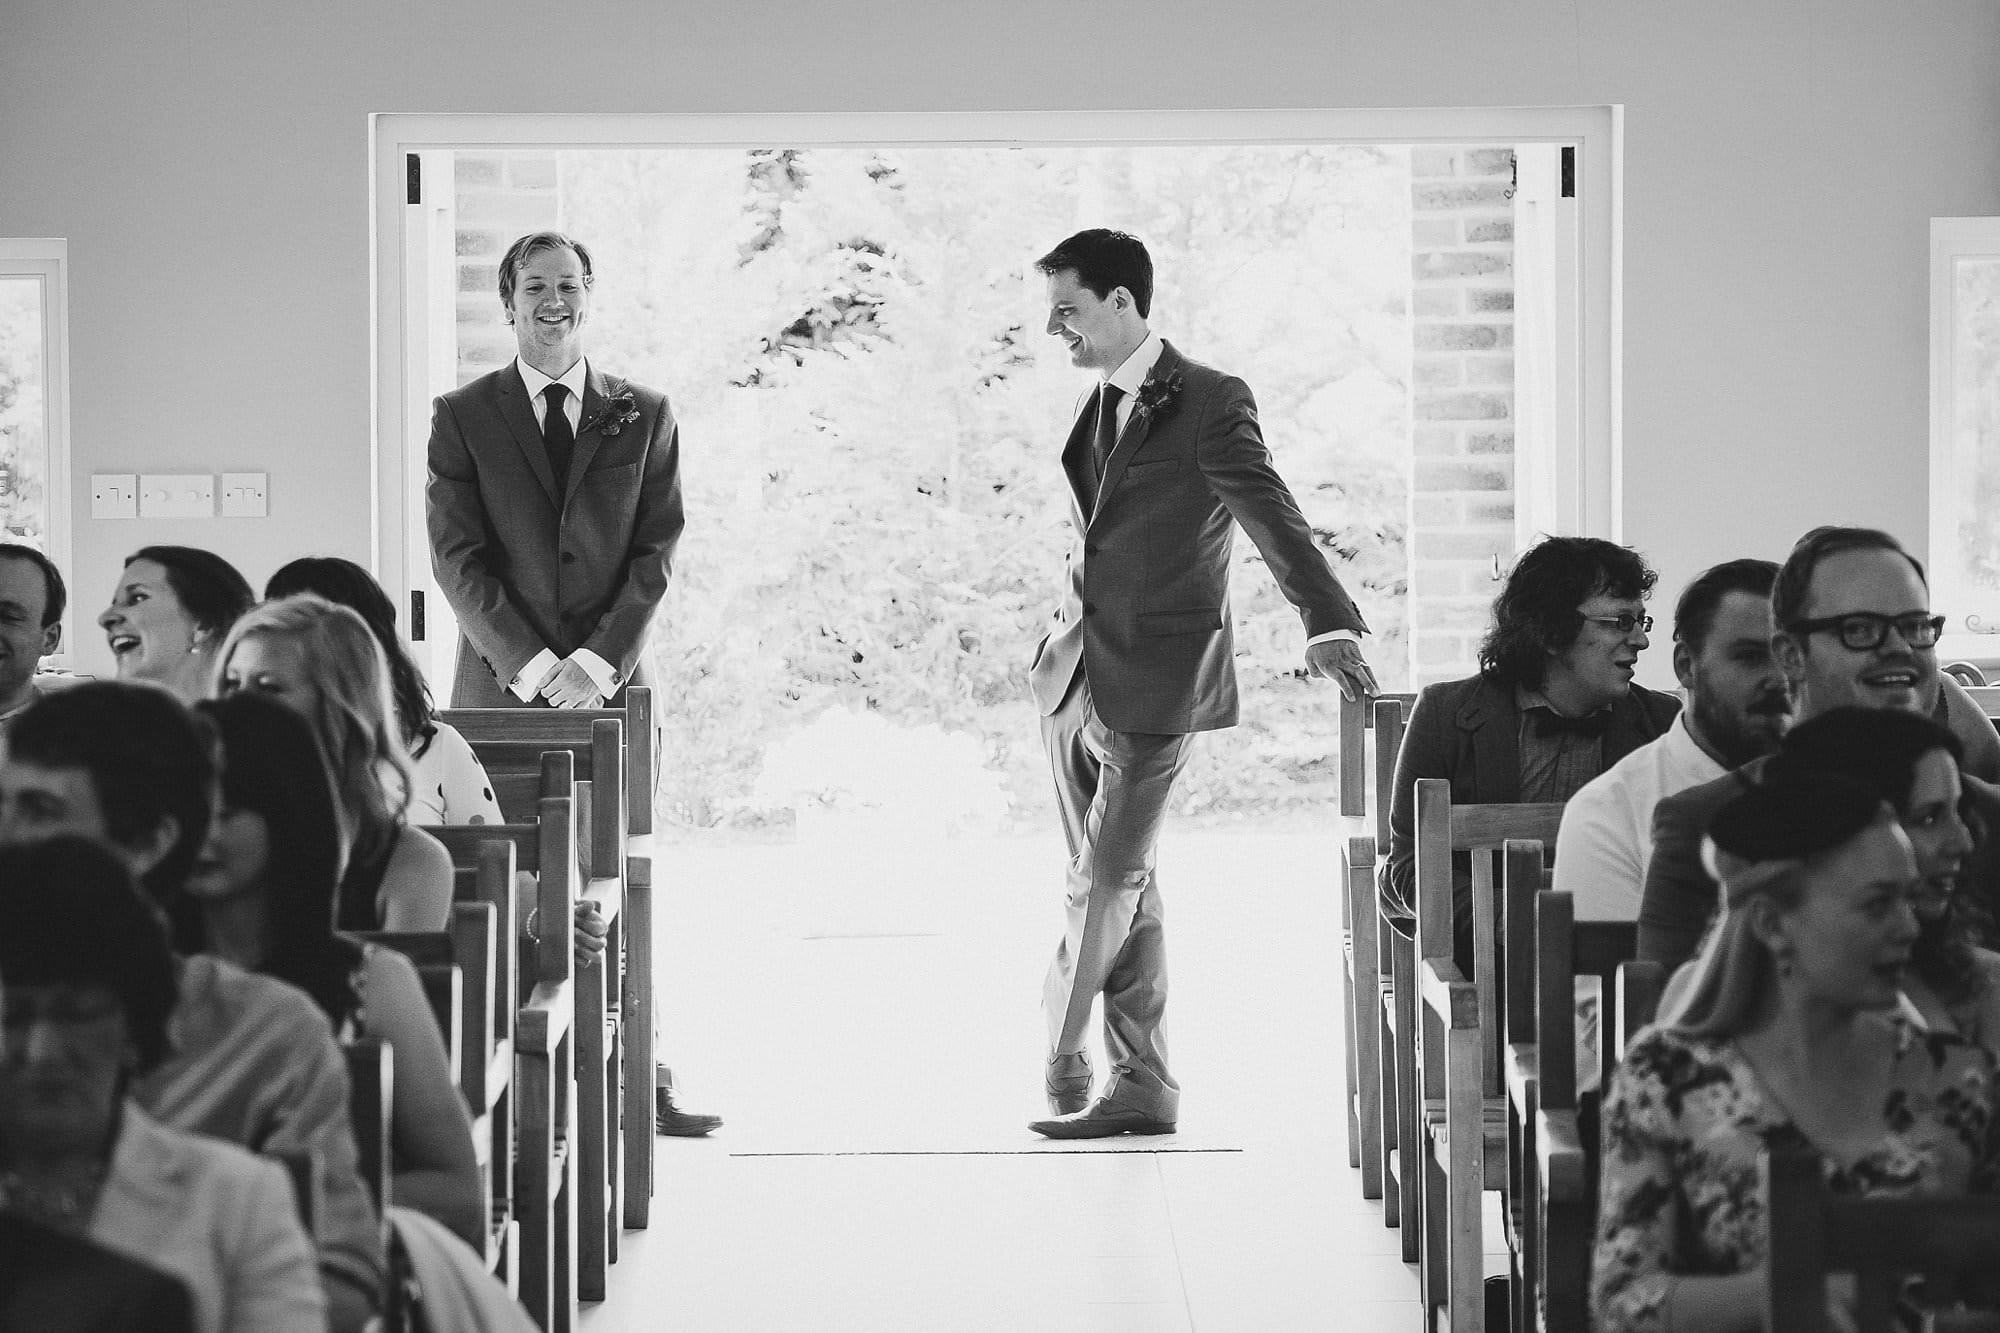 oaks farm wedding photographer cj 035 - Cat + Jake   Oaks Farm Wedding Photography